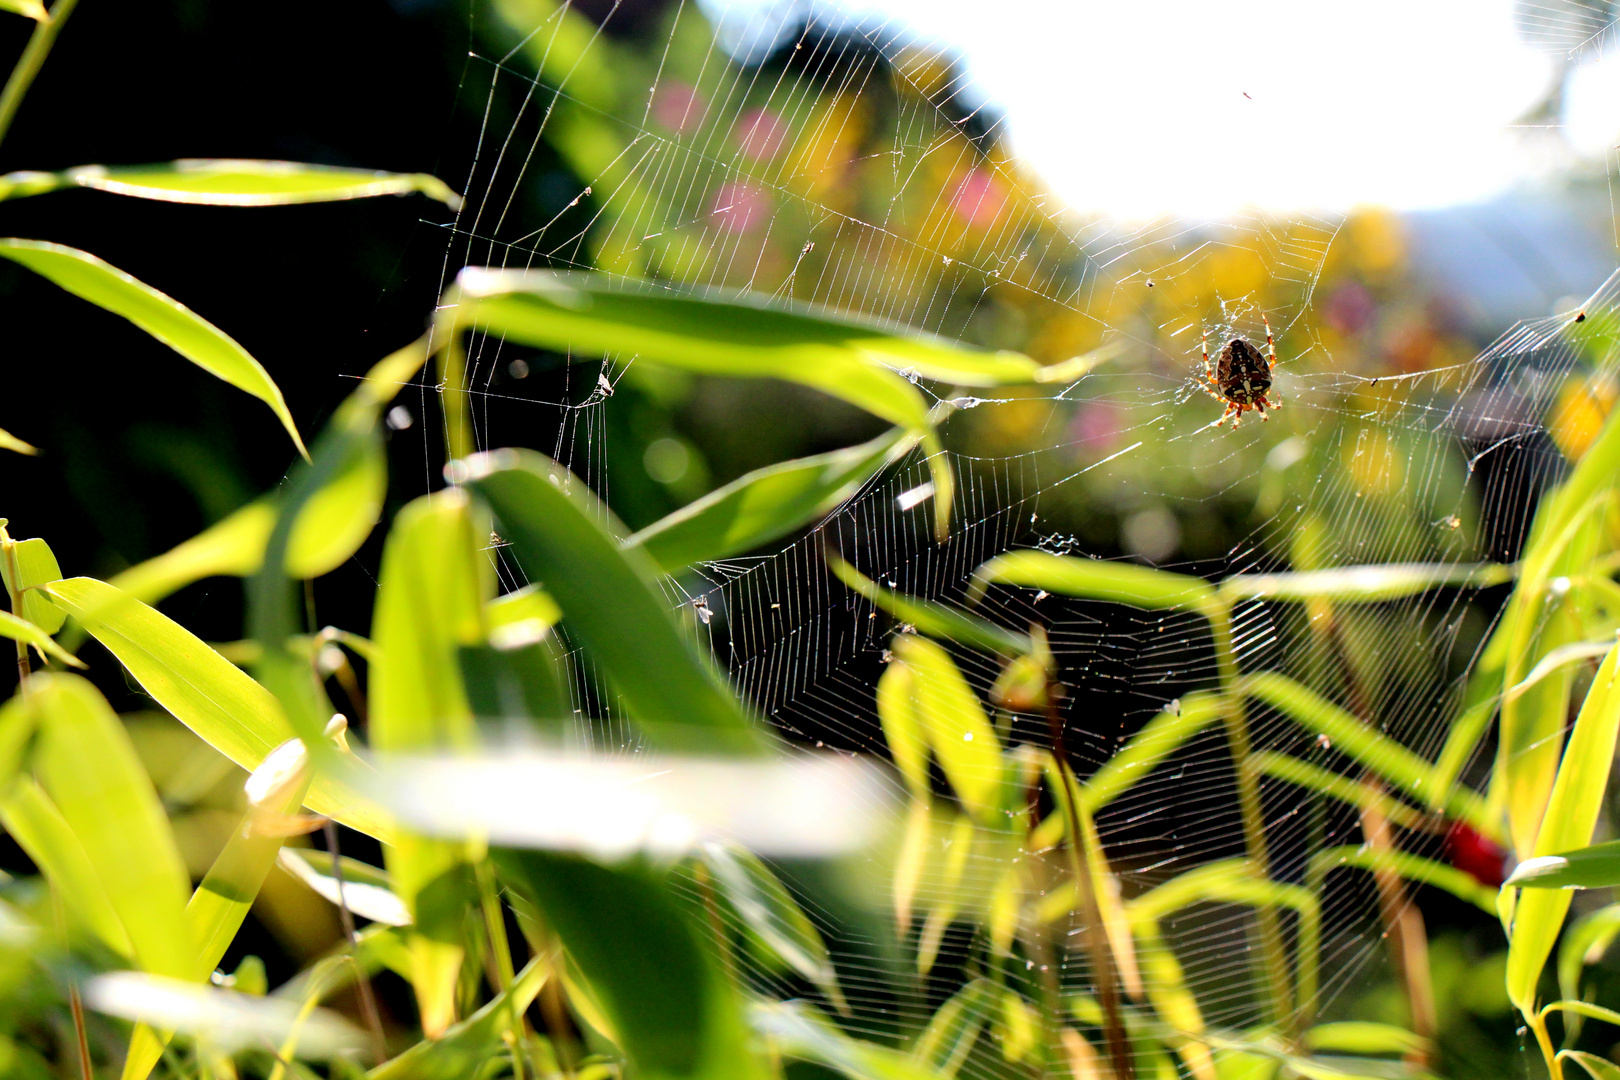 Spinnennetz'